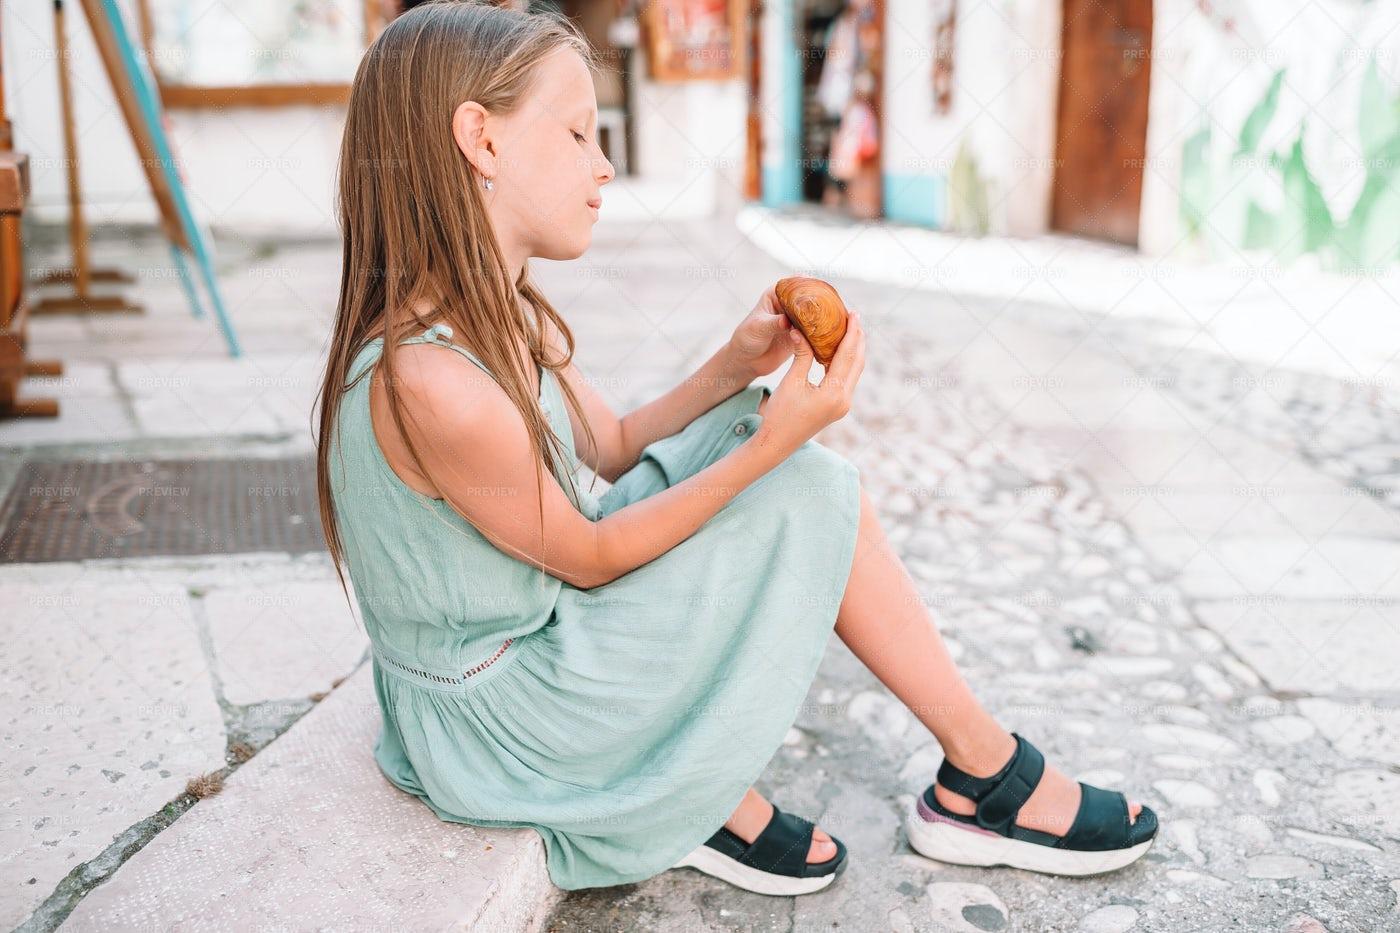 Eating A Croissant: Stock Photos